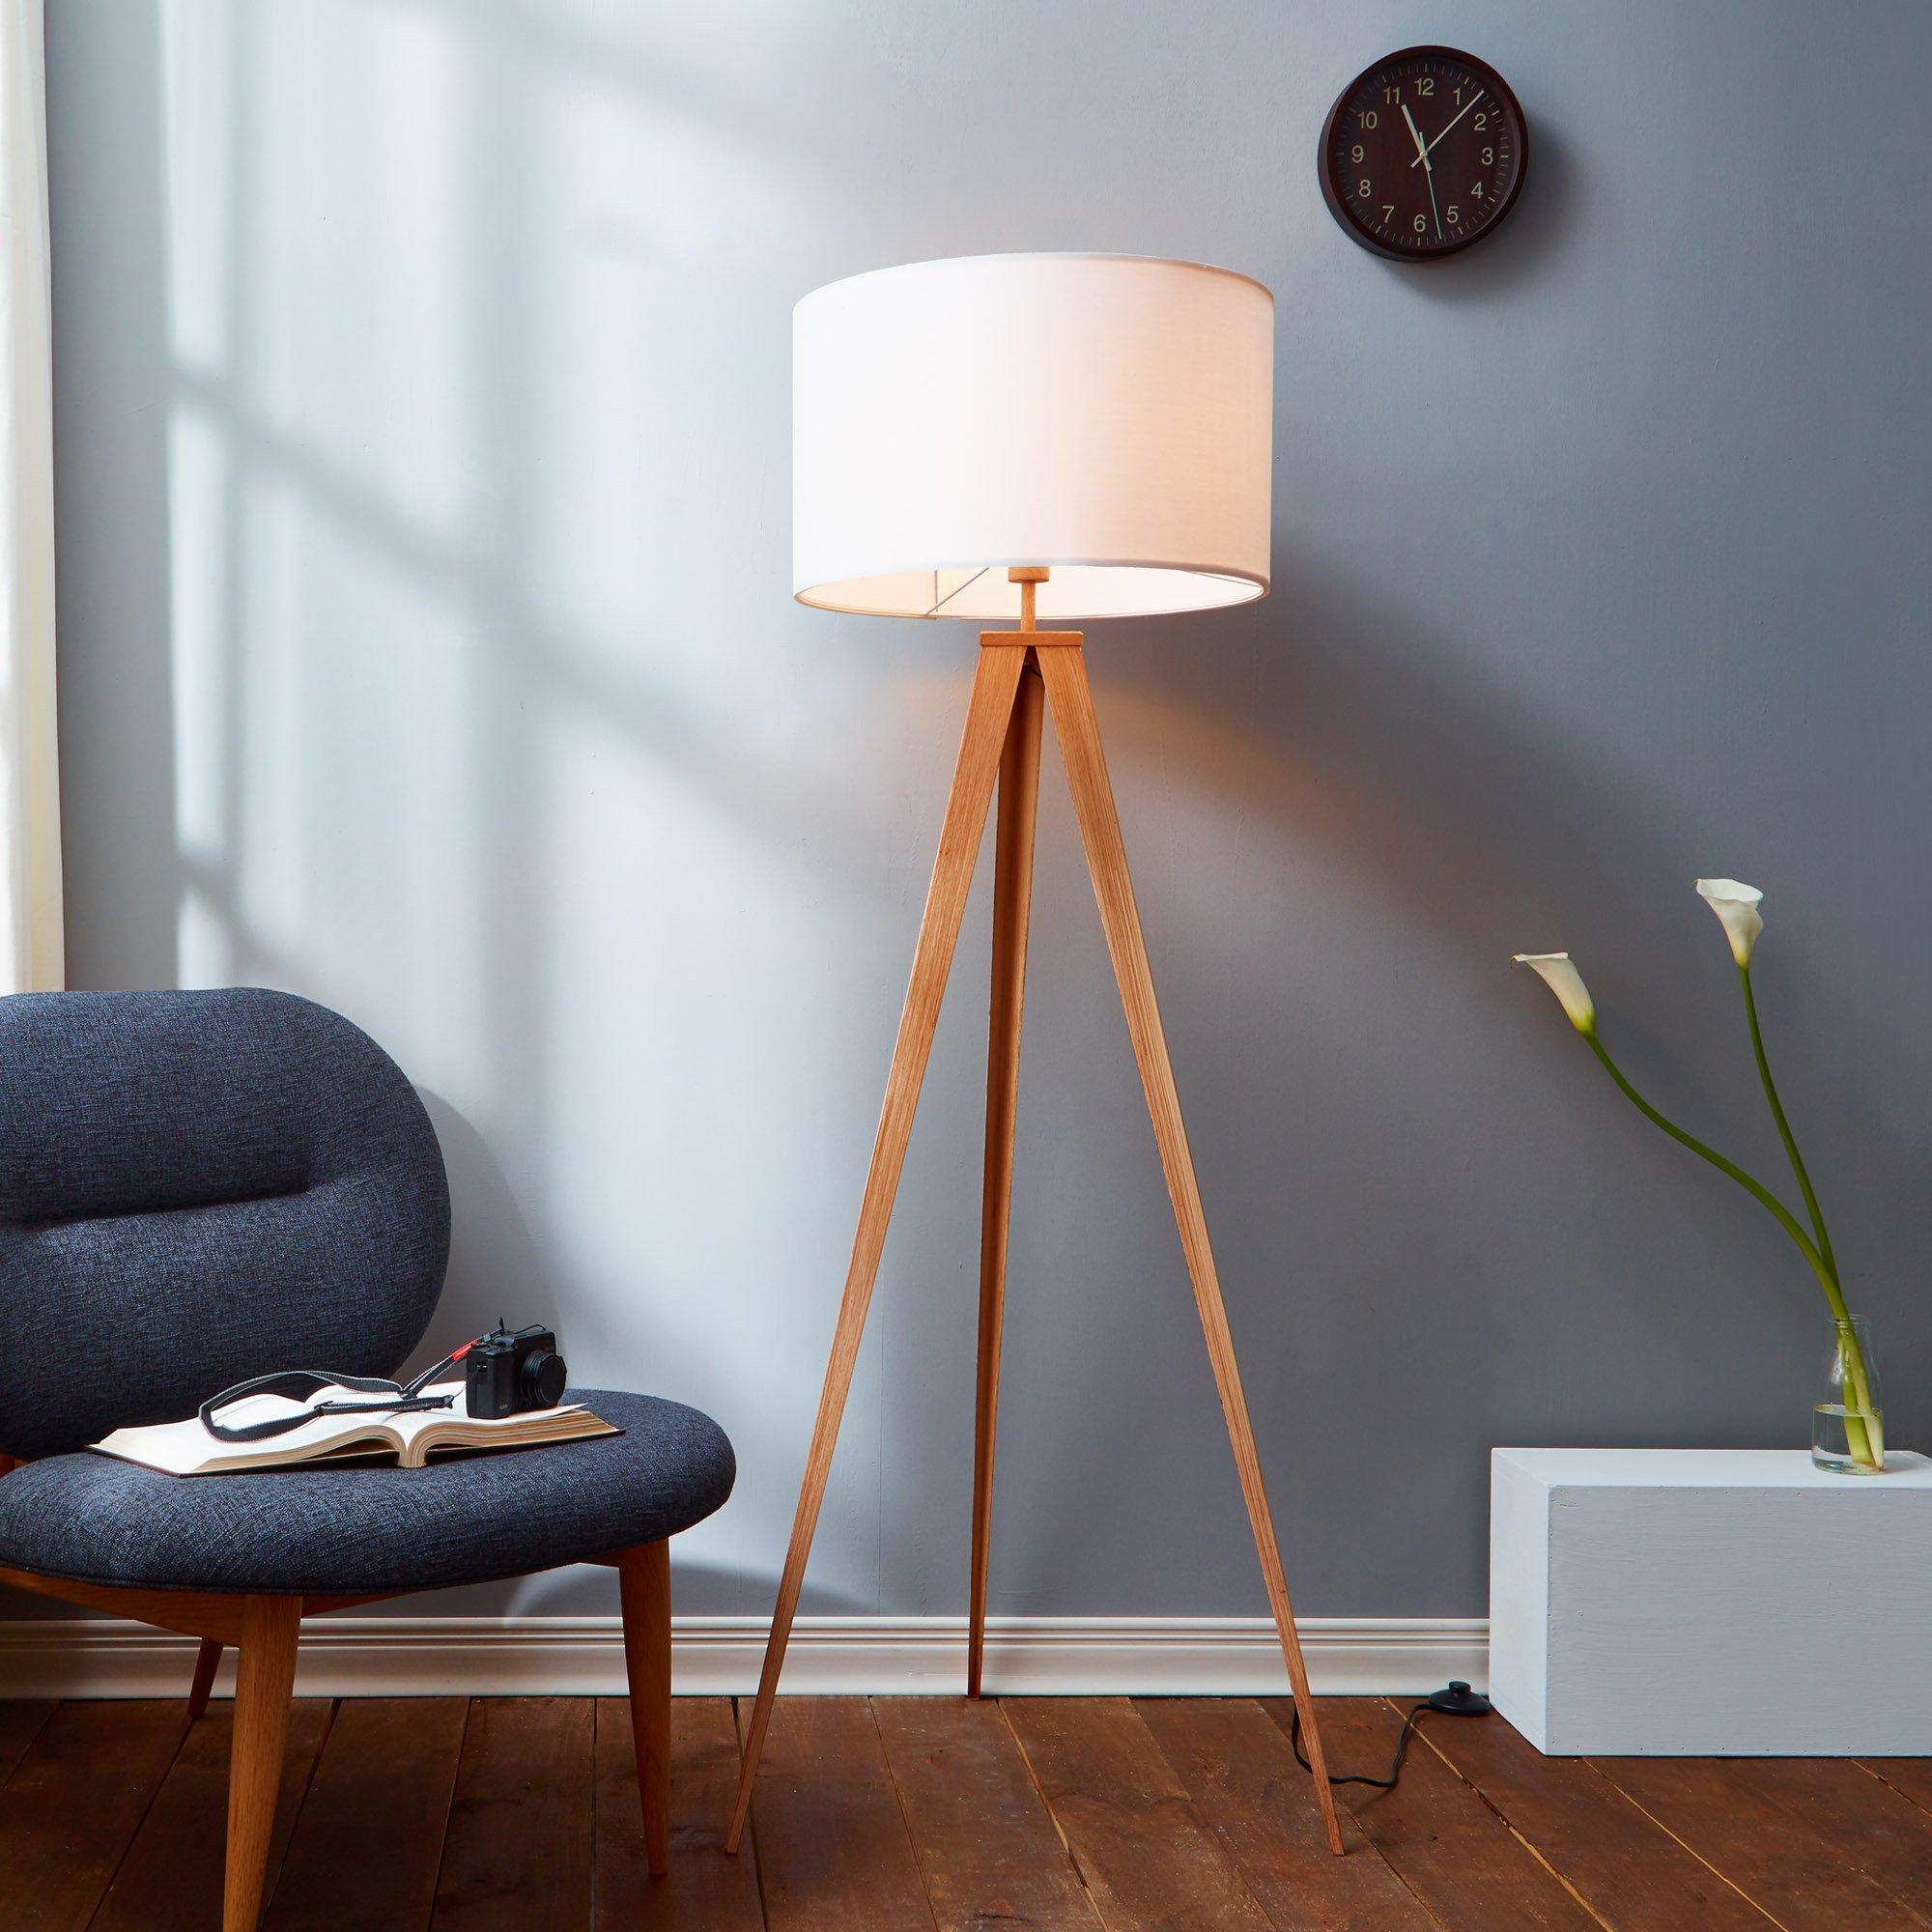 Versanora VN-L00007 Romanza Tripod Floor Lamp, White/Faux wooden leg by Versanora (Image #2)